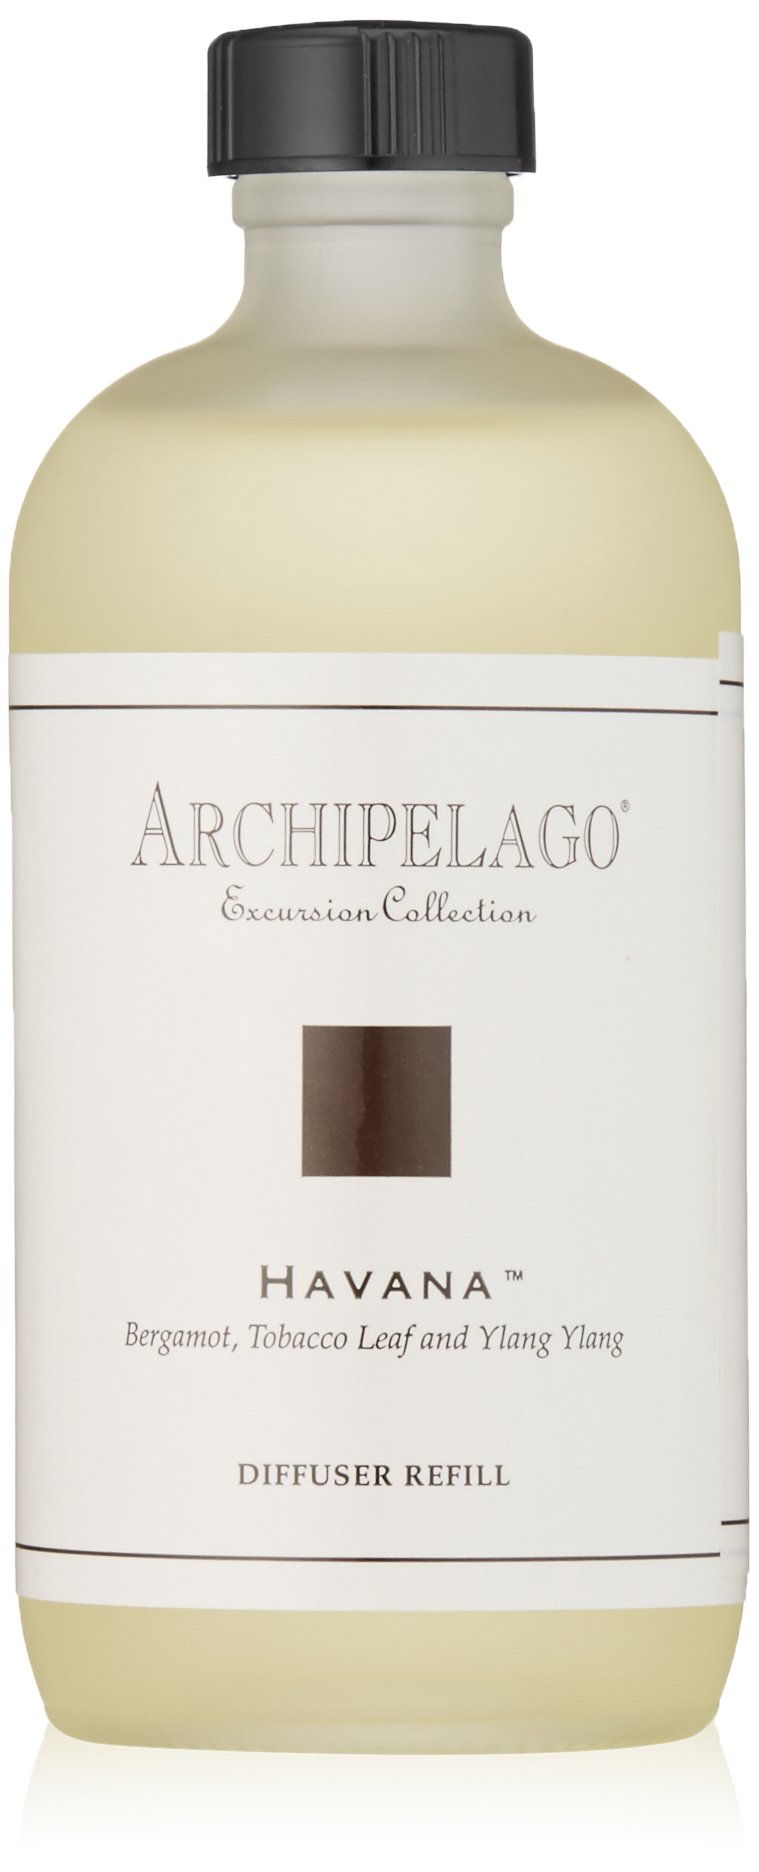 Archipelago Havana Diffuser Oil Refill,7.85 Fl Oz by Archipelago Botanicals (Image #1)